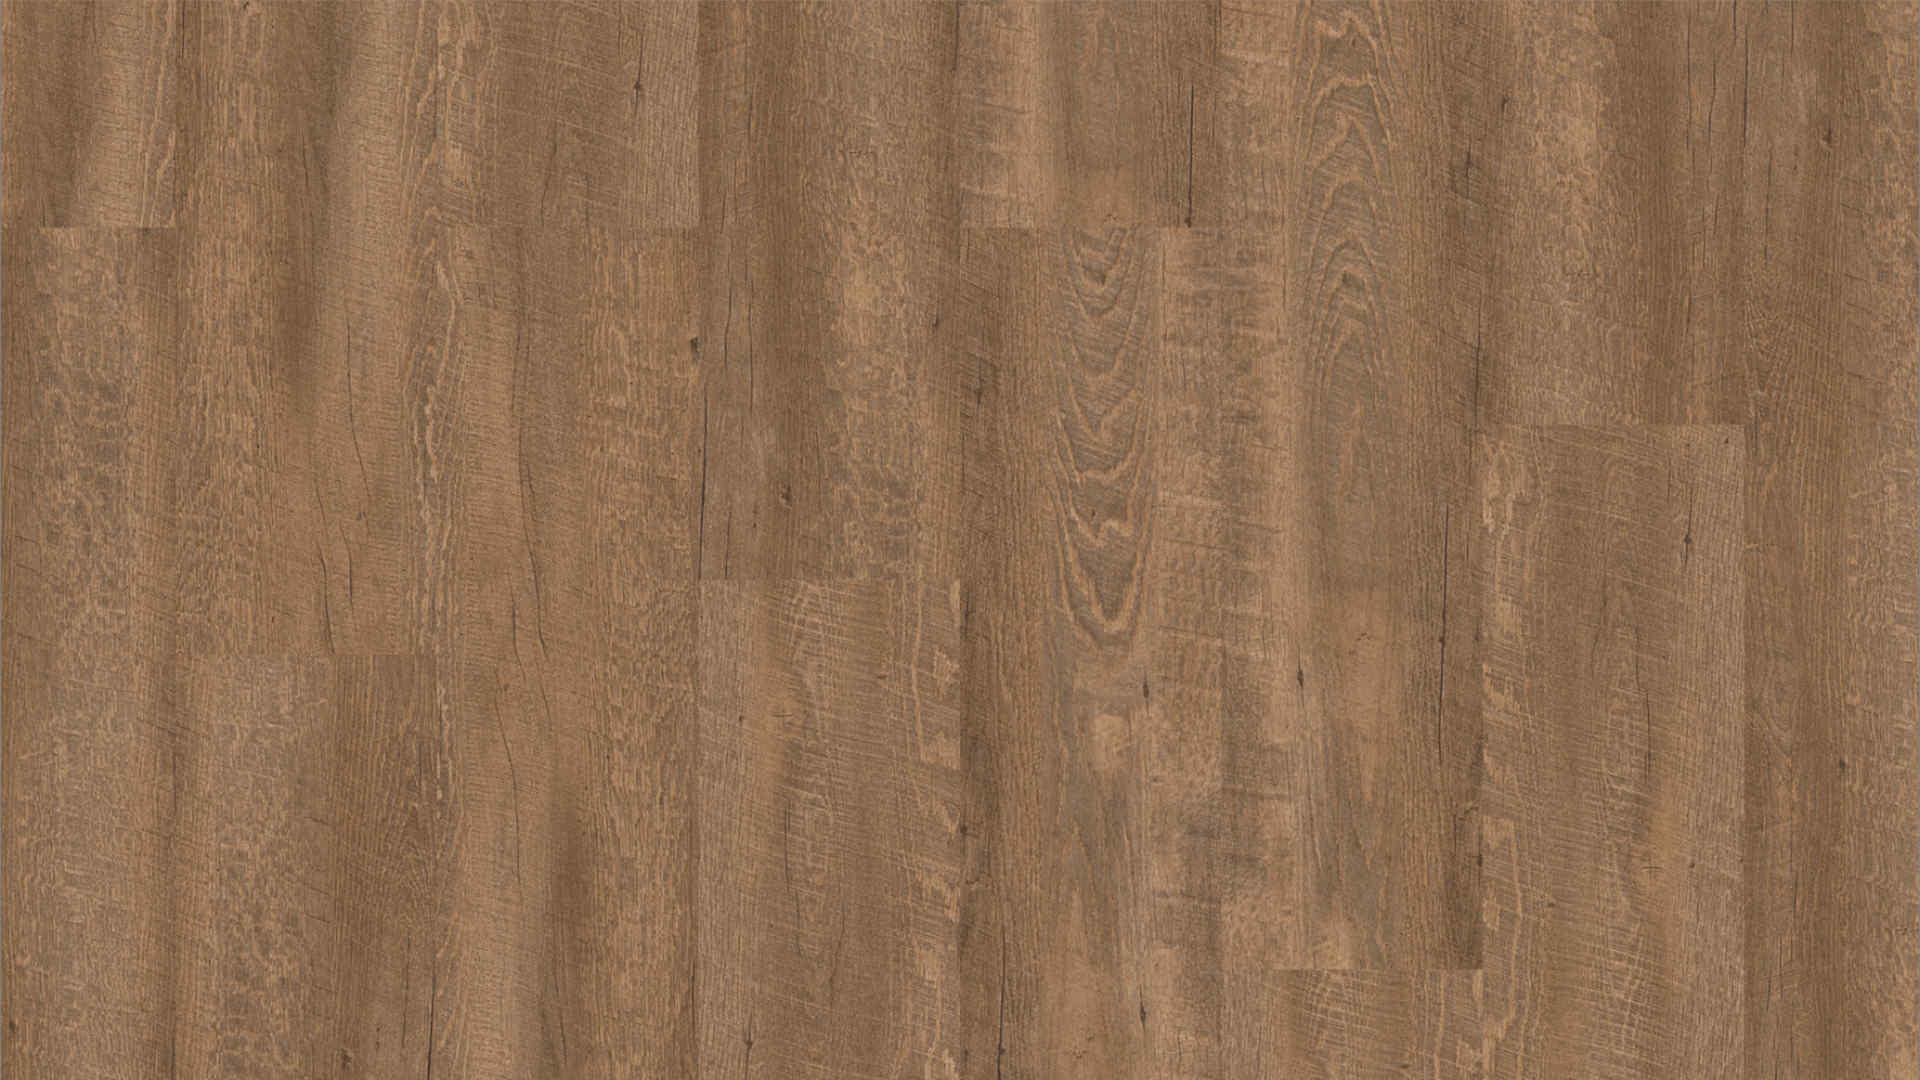 3 34qm Smoked Oak Natural Id Essential30 Designbelag Tarkett